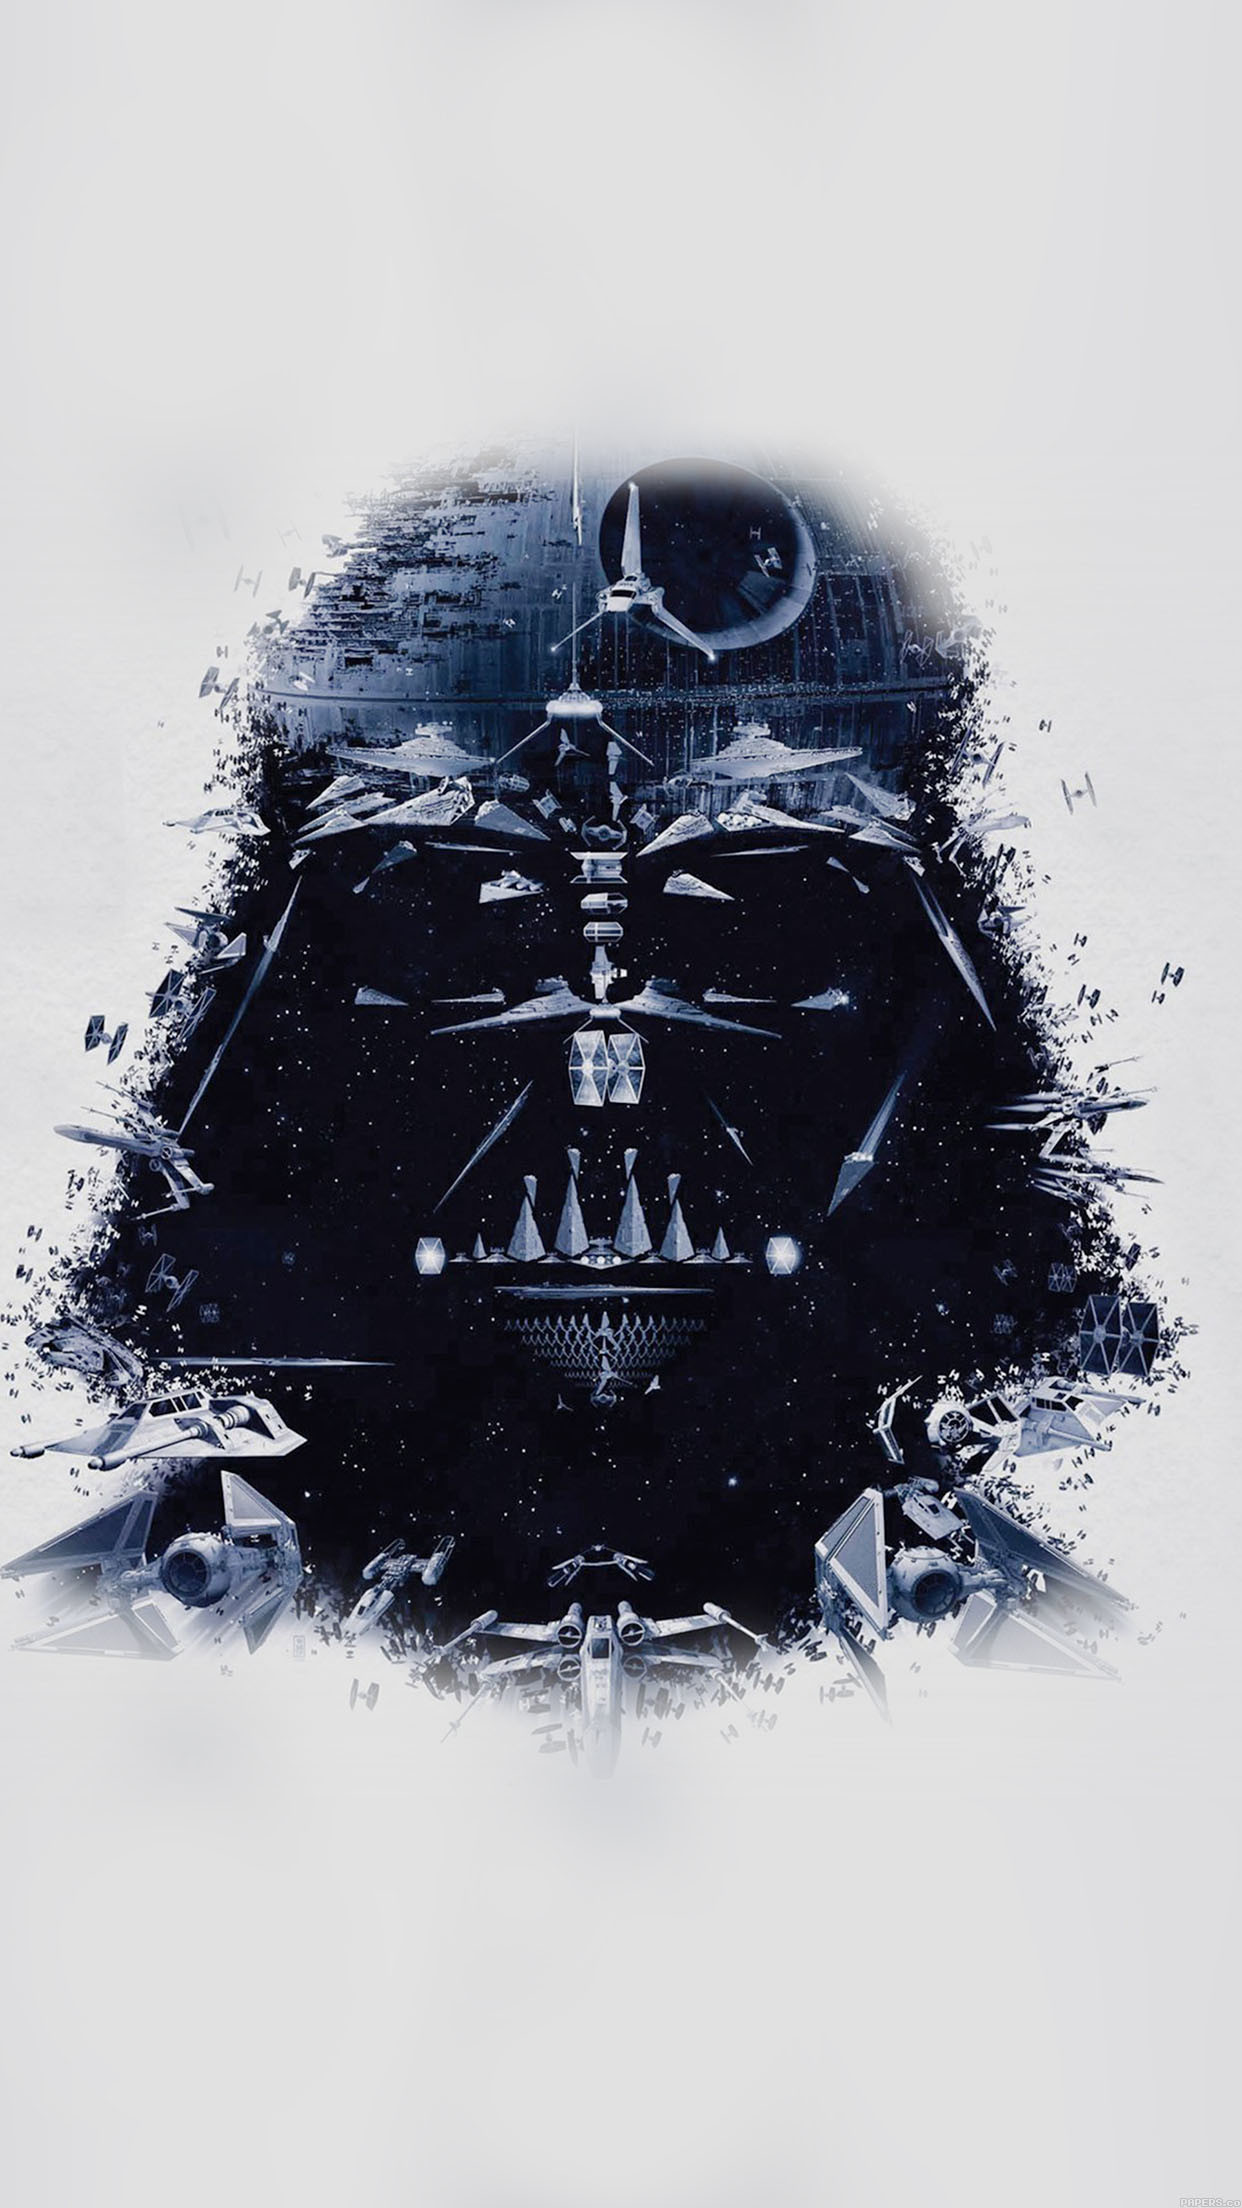 ☺Fond d'écran iphone HD iphone 7 8442. Star Wars Wallpaper …